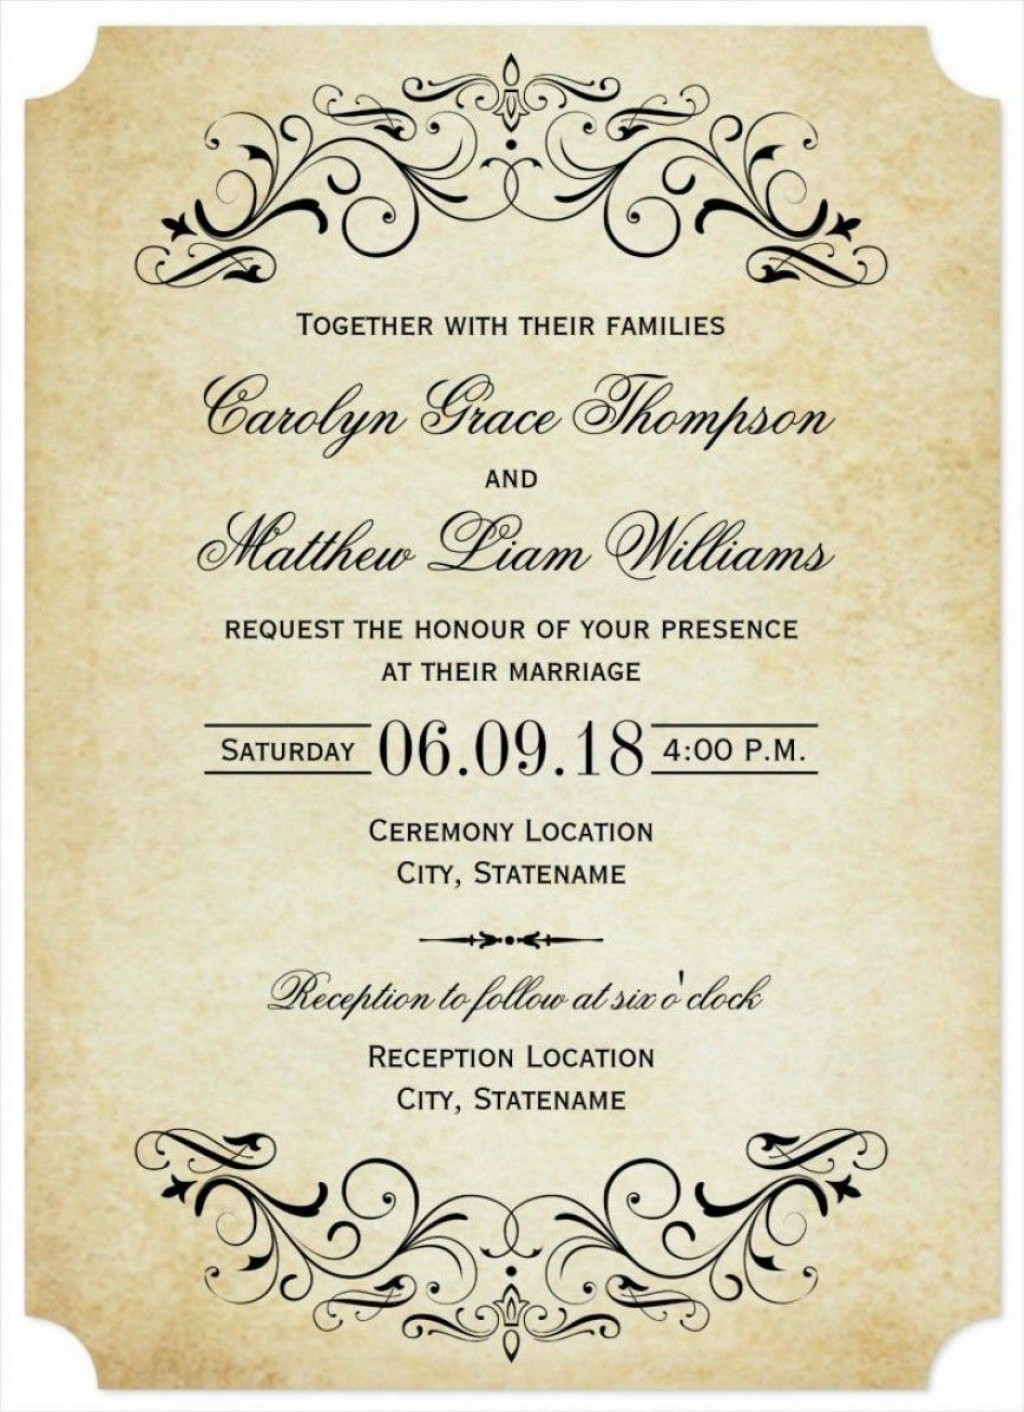 000 Stupendou Formal Wedding Invitation Wording Template High Resolution  TemplatesLarge